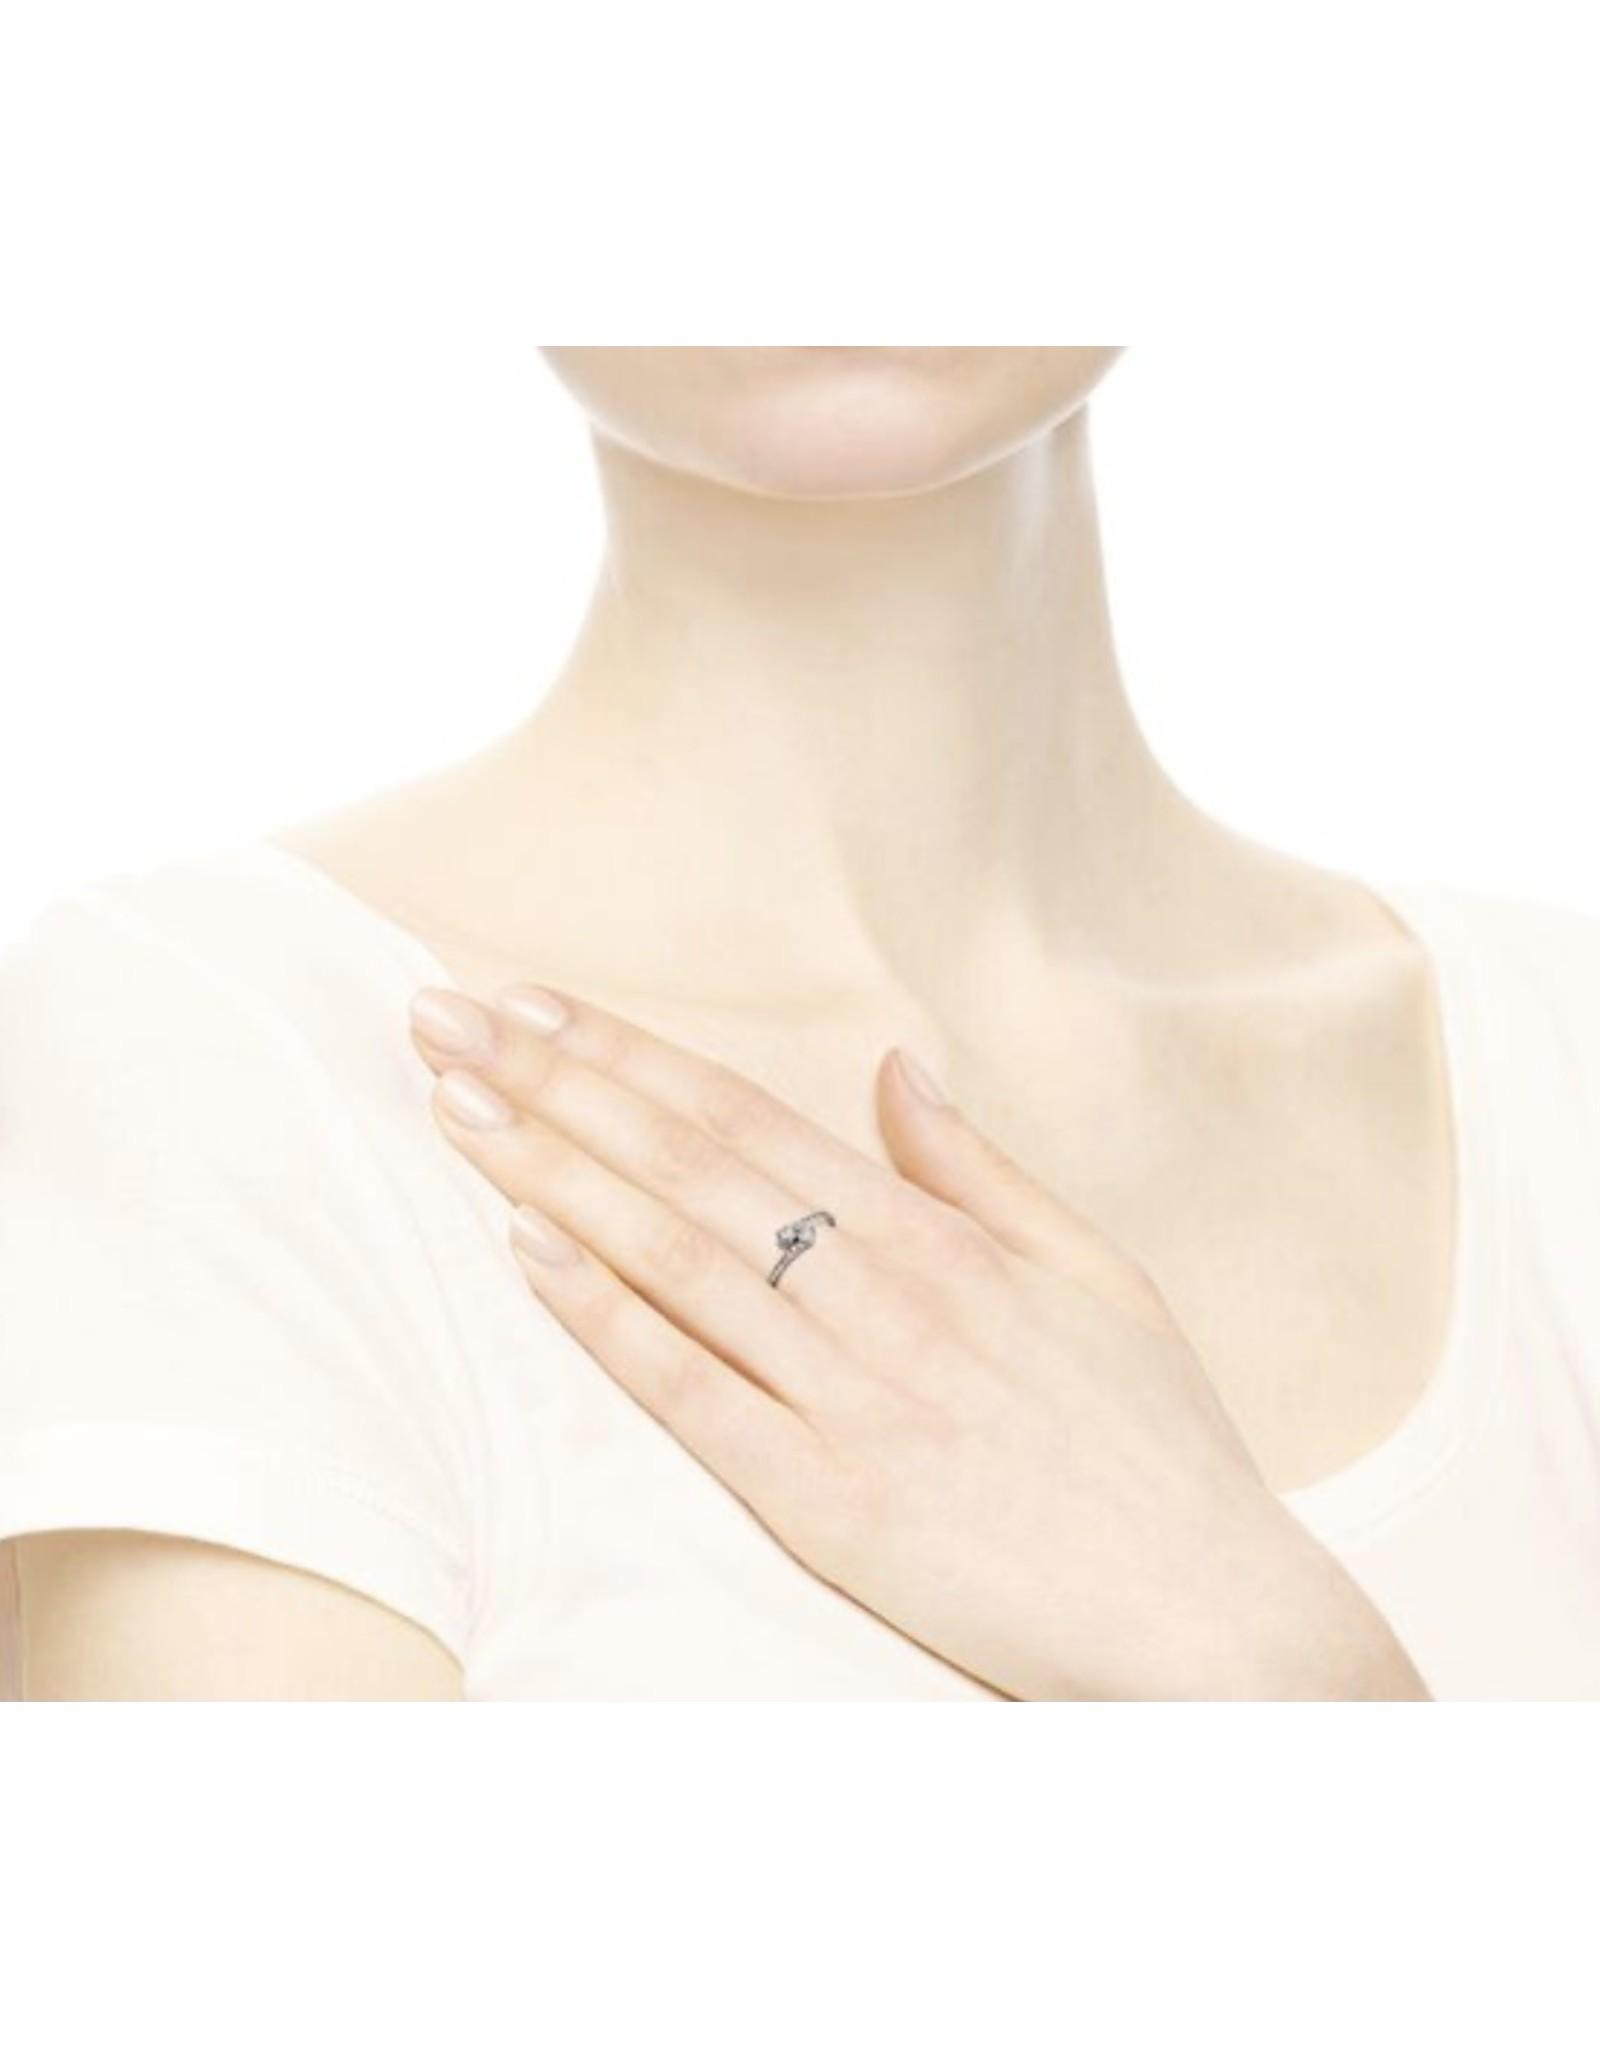 Pandora Pandora Ring, 191023CZ, Forever Hearts